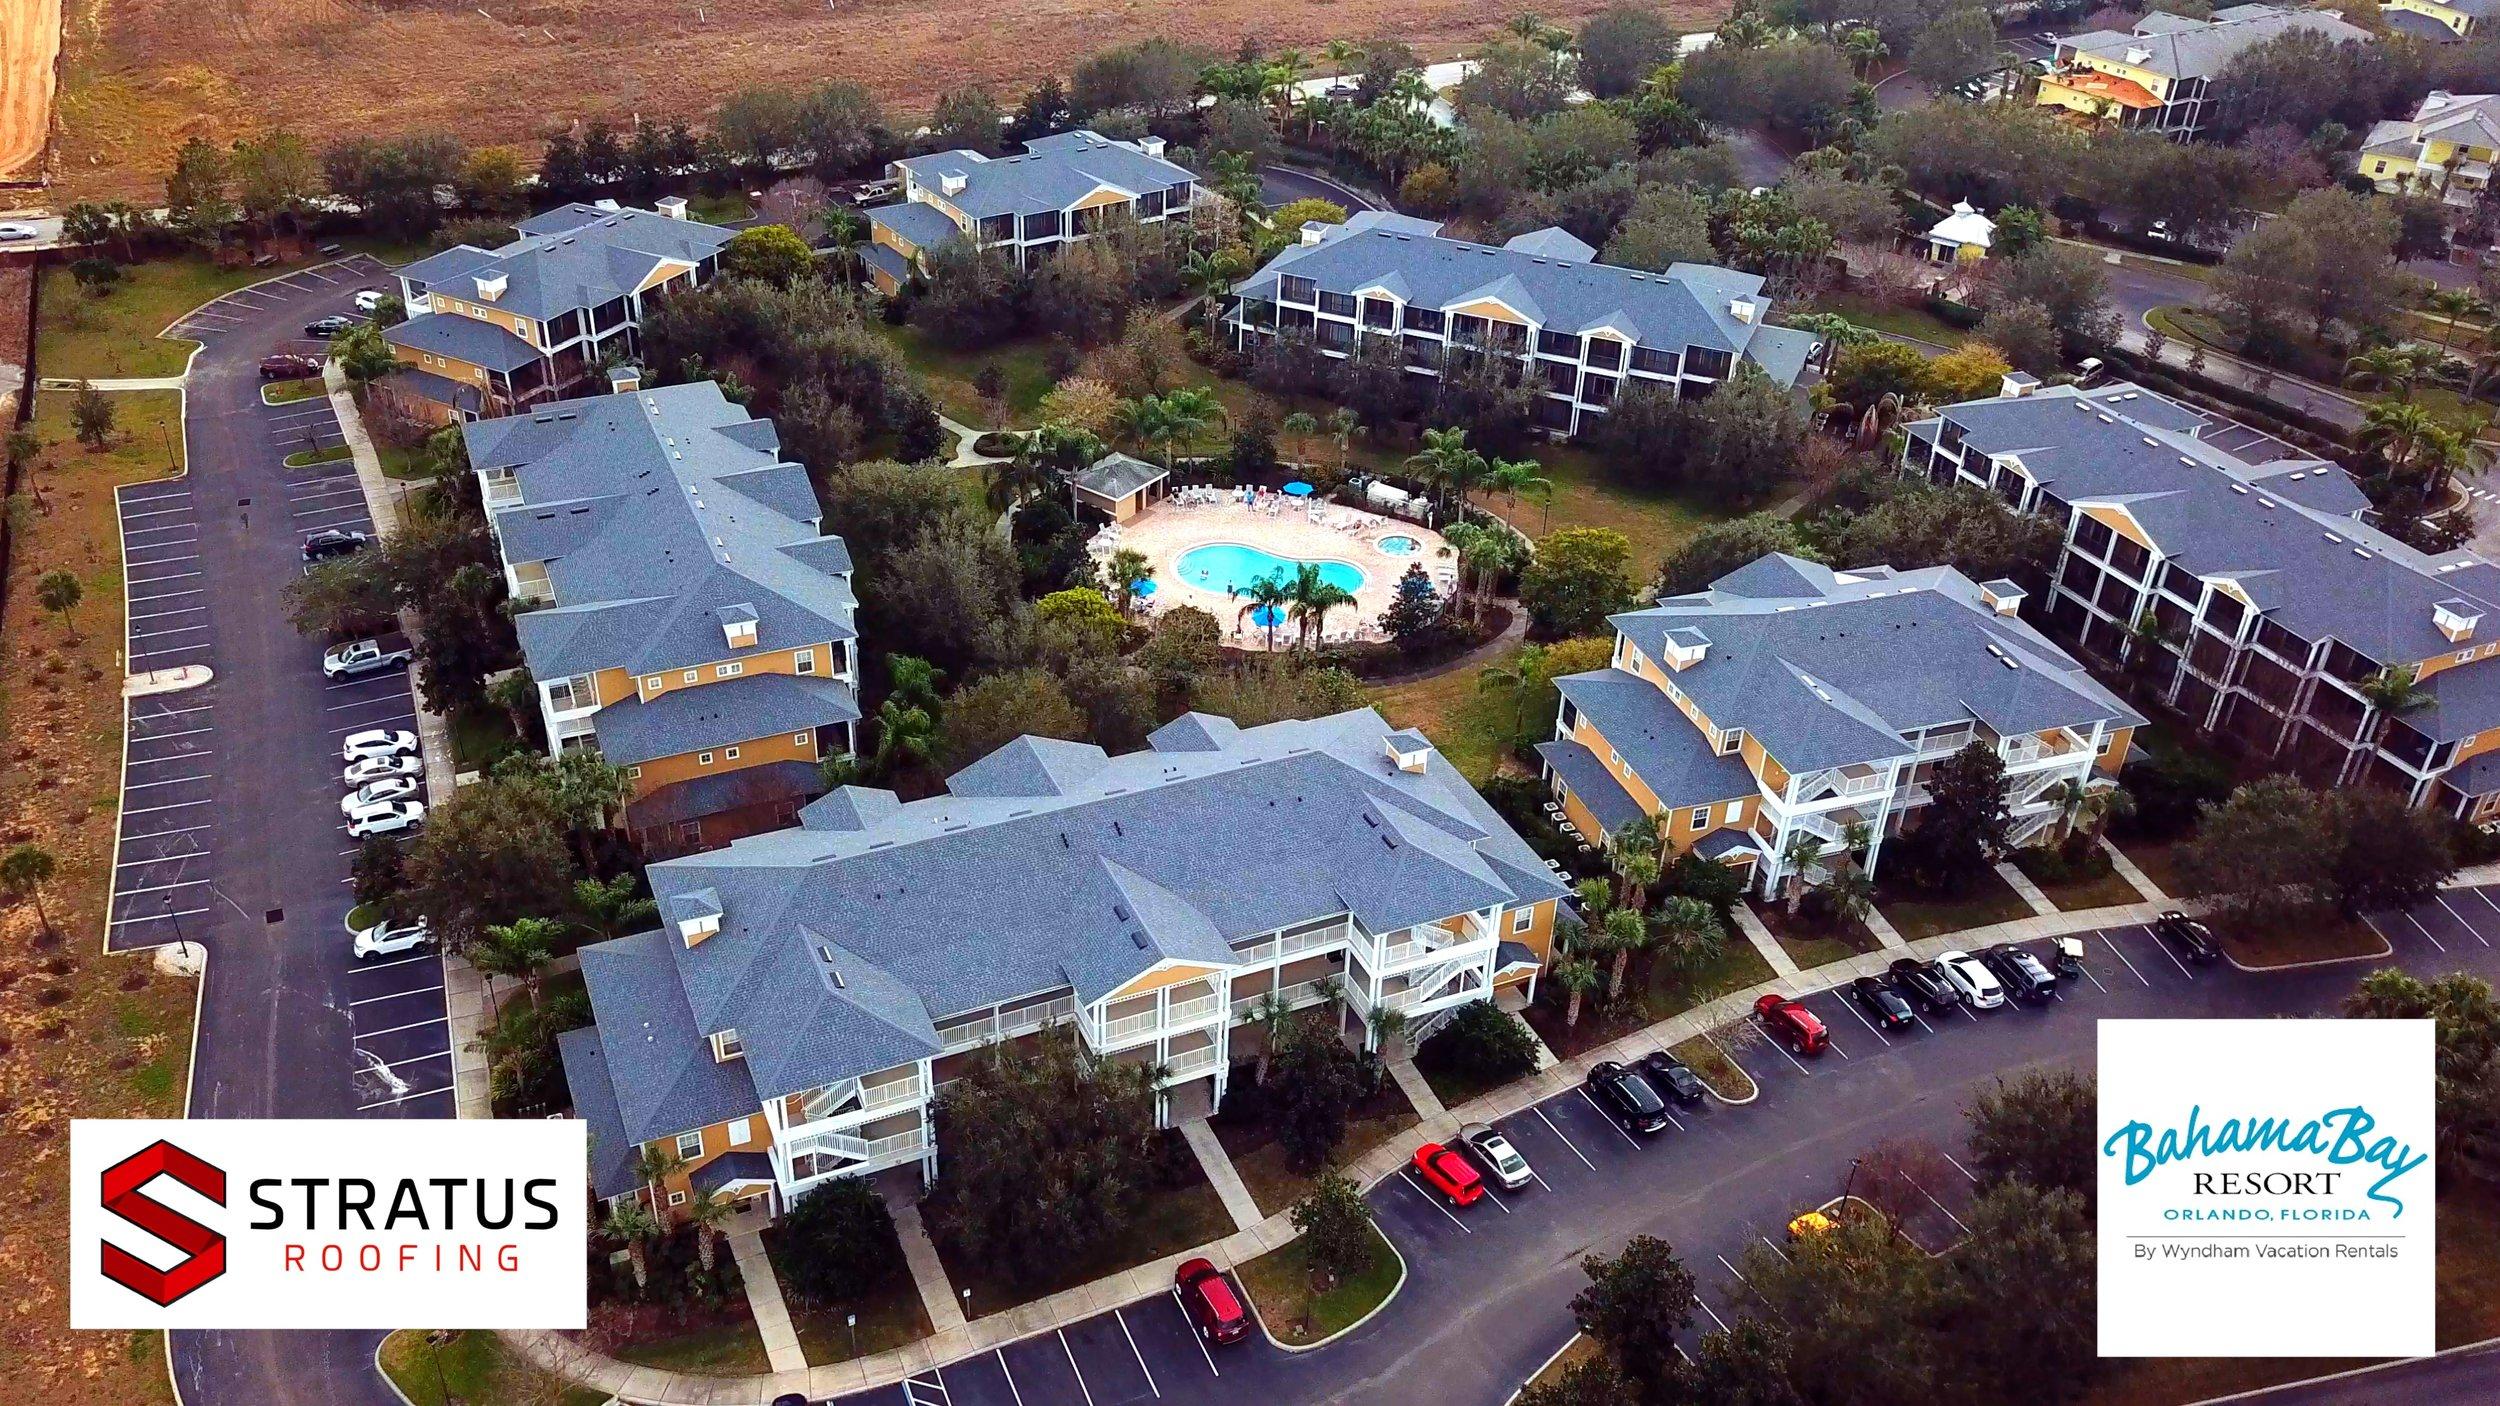 Bahama Bay Resort by Wyndham